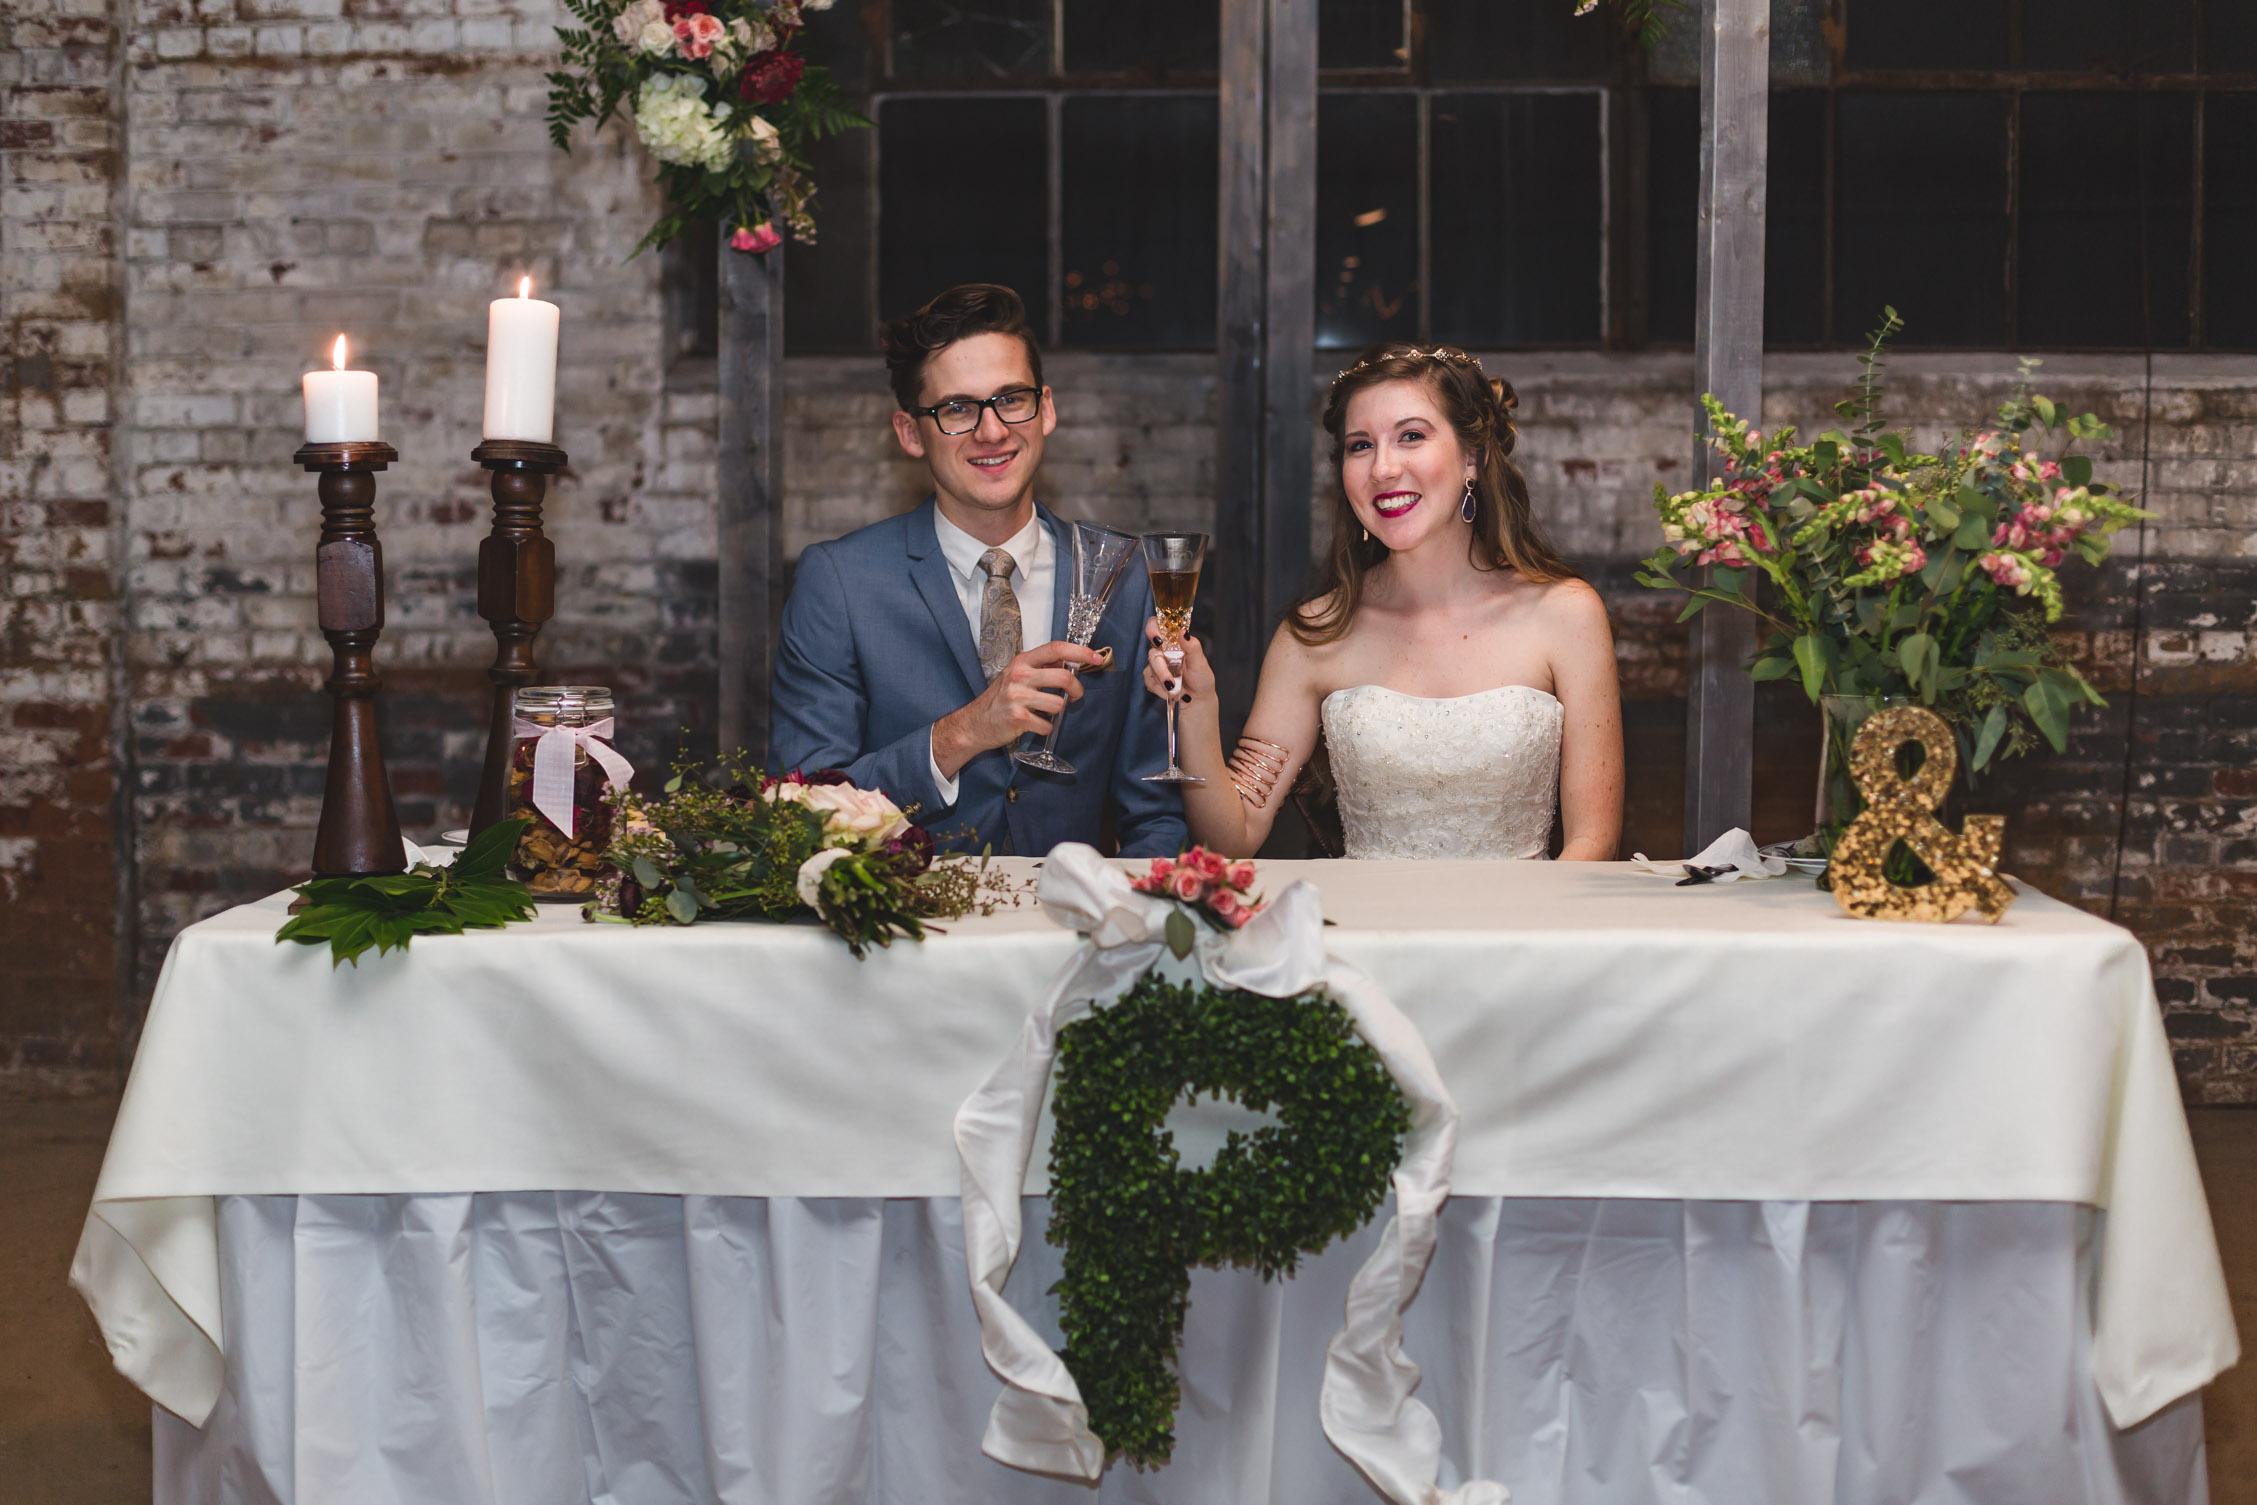 Adam-Szrmack-The-Glass-Factory-Wedding-141.jpg